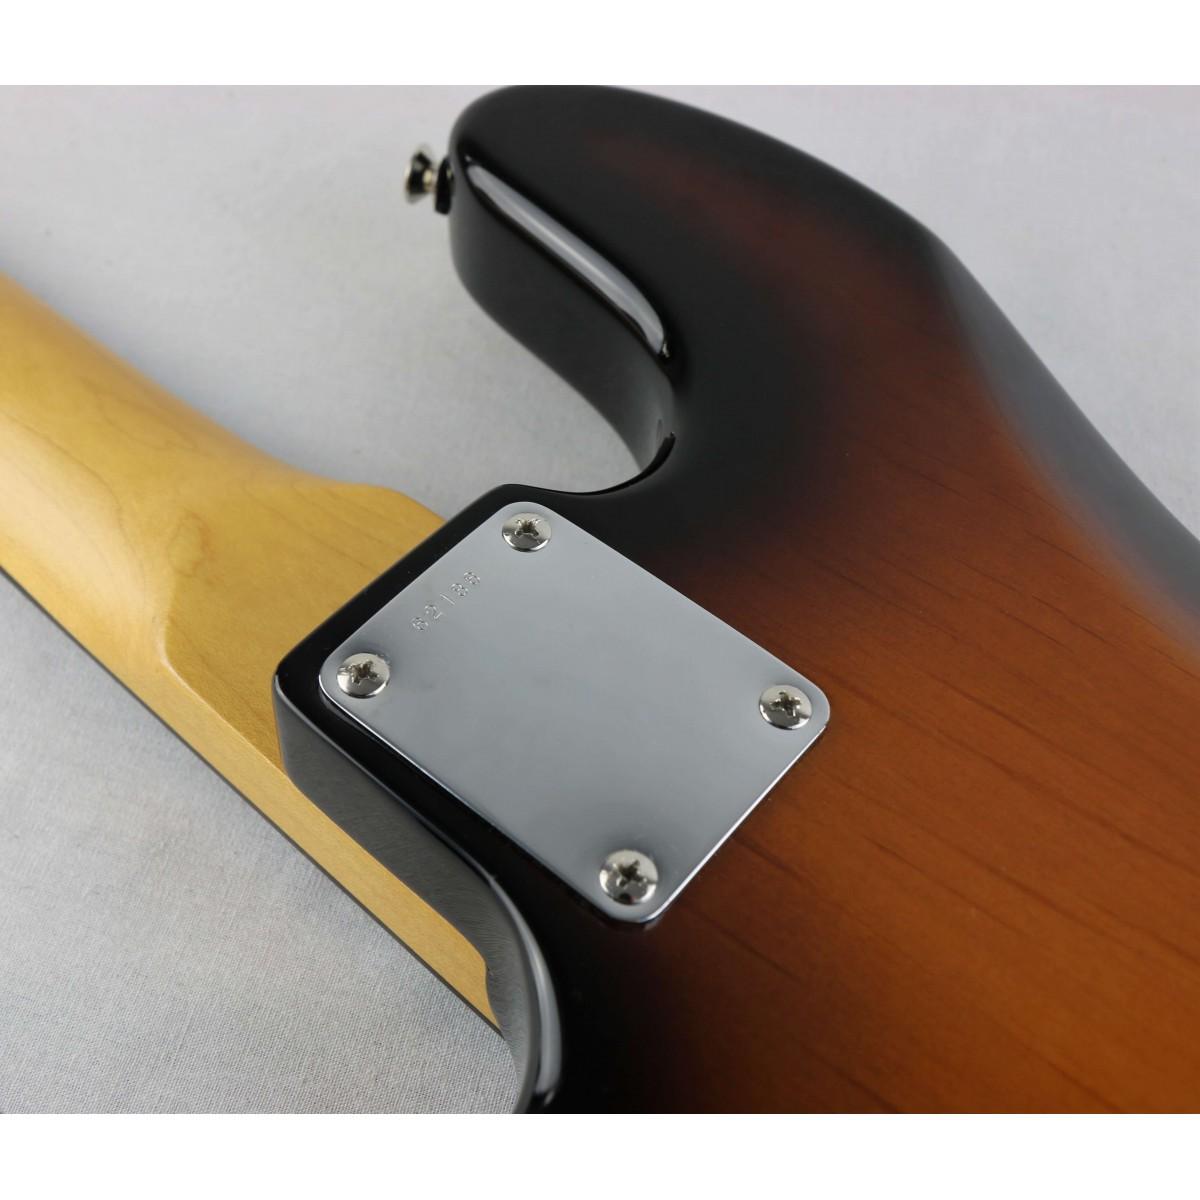 KTS SELLETTE TREMOLO 11.2 mm SET/6